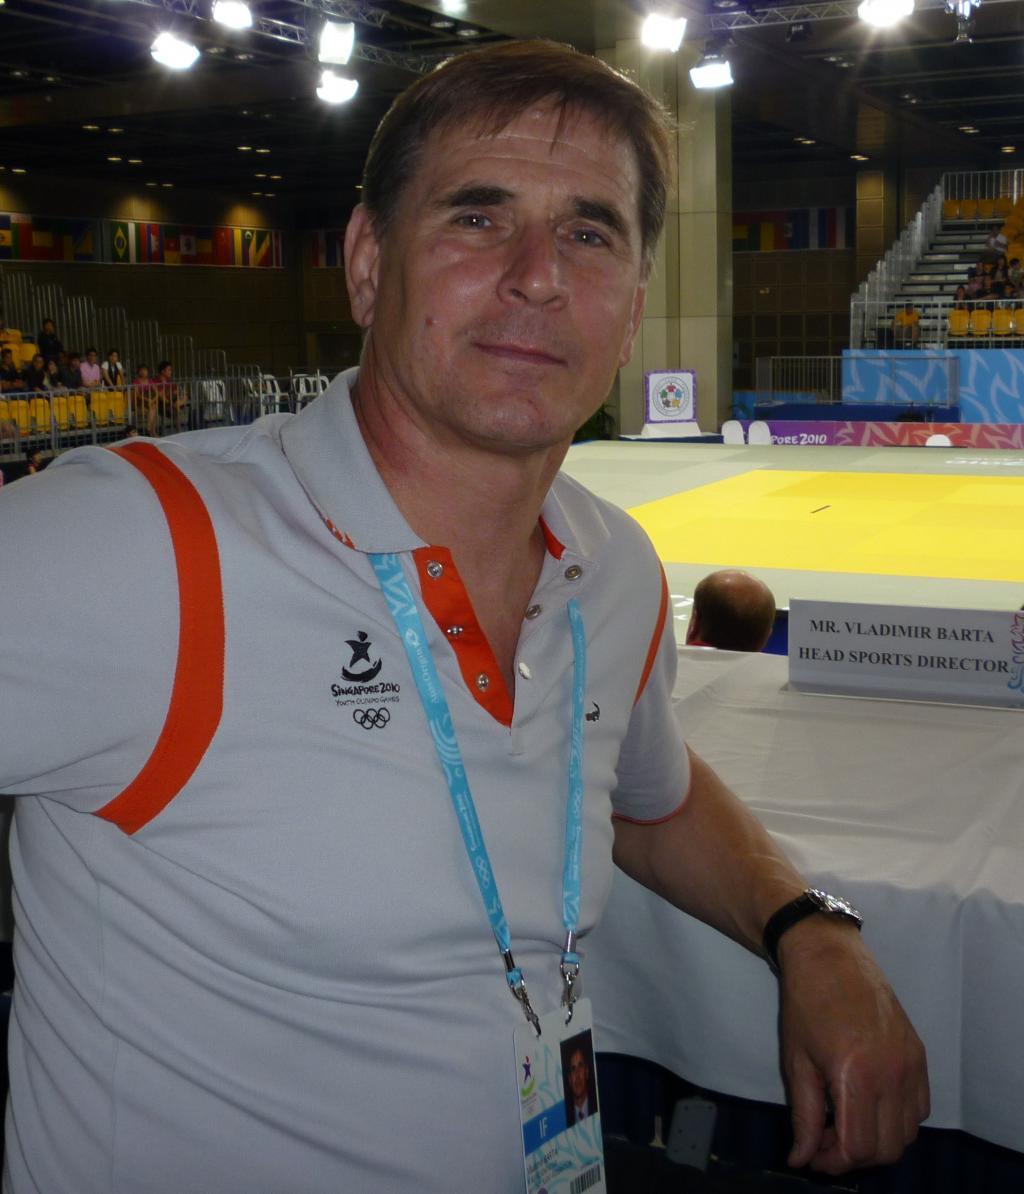 Vladimir Barta pleased with YOG organisation and level